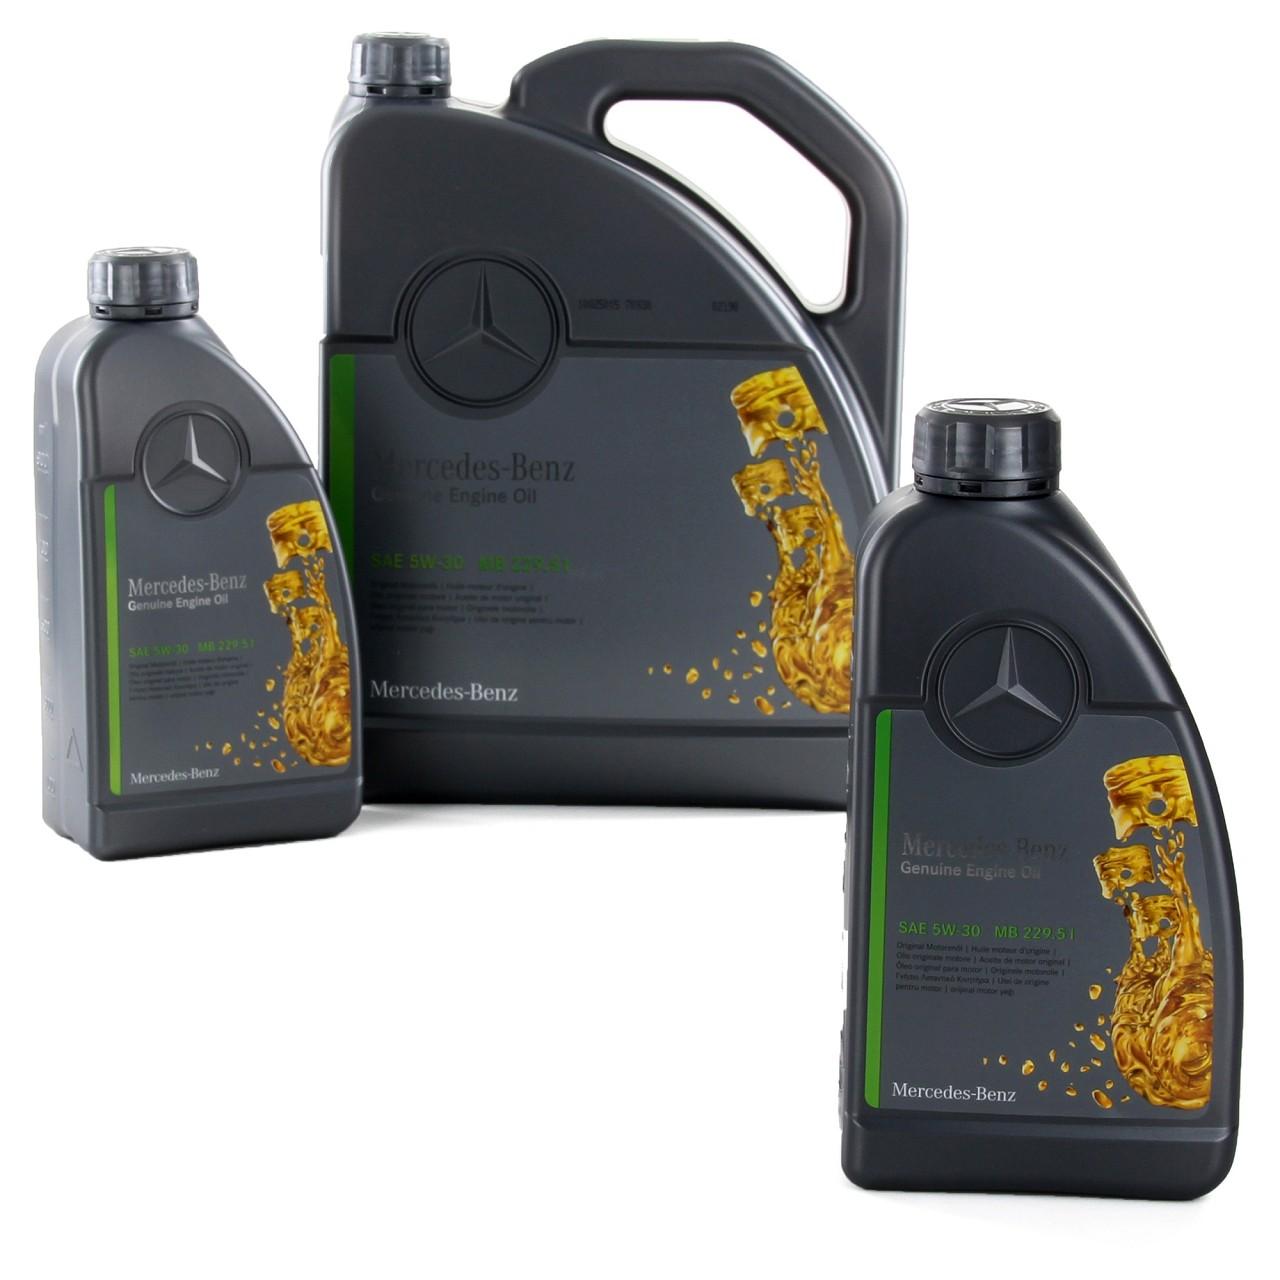 ORIGINAL Mercedes-Benz Motoröl Öl 5W-30 MB 229.51 7L 7 Liter 0009899402